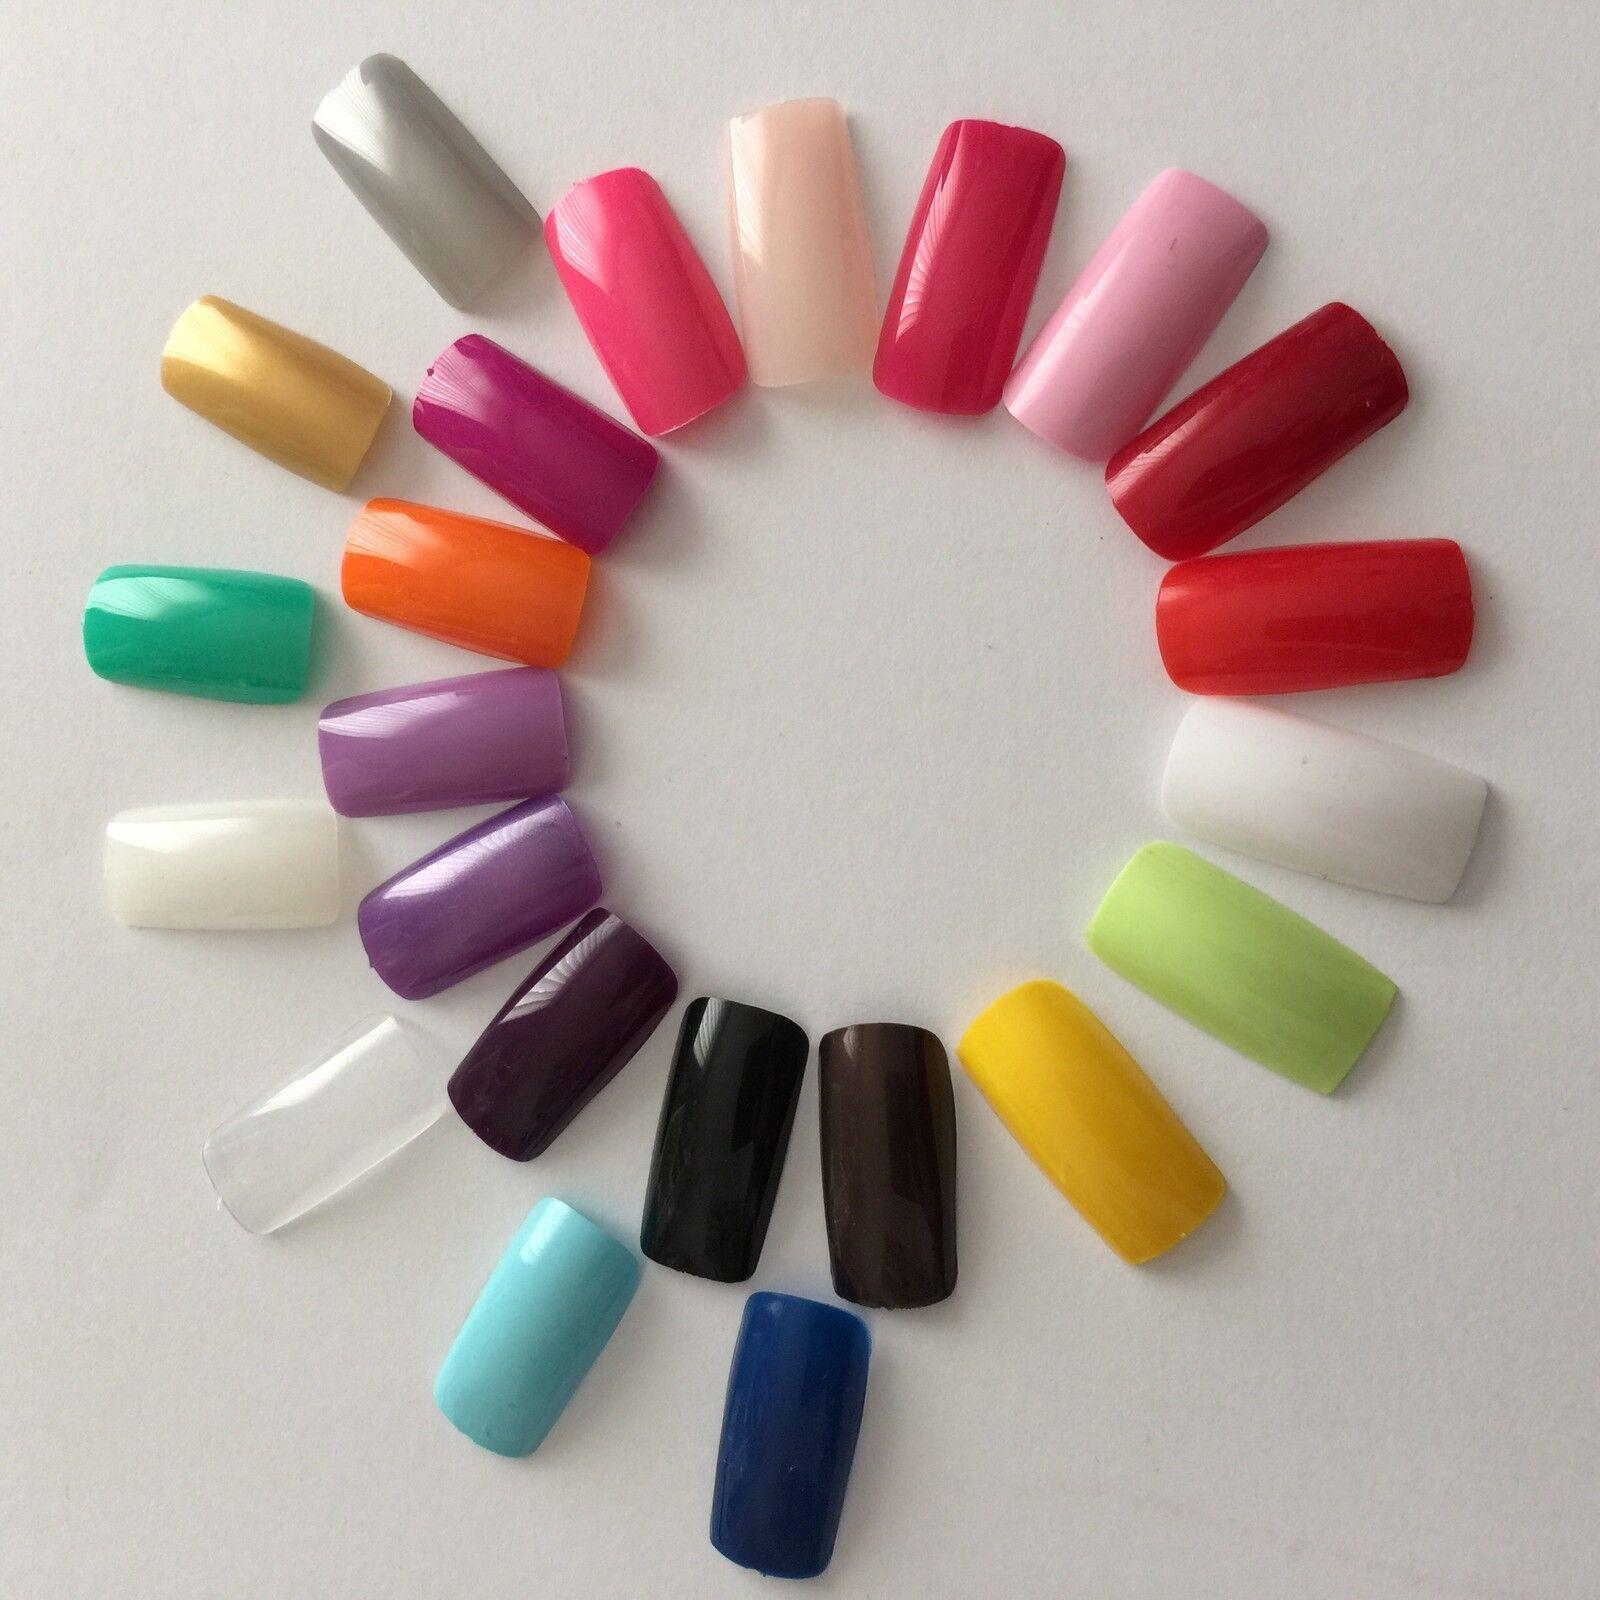 Künstliche Fingernägel Full Size Cover Nail Tips in vielen Farben Square Nails